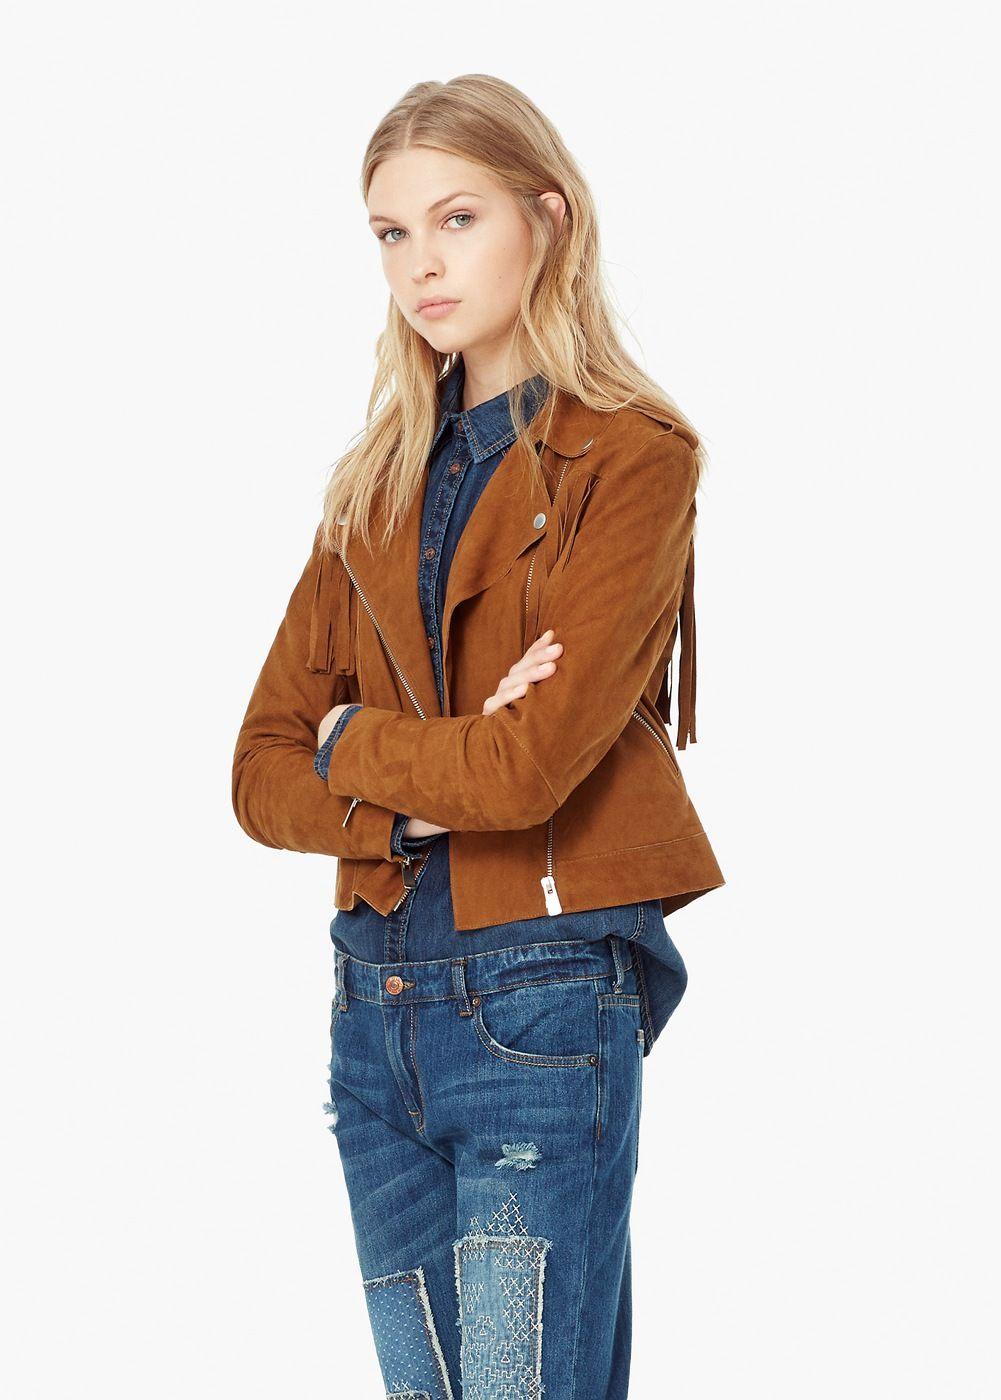 899484a0 Mango Fringed suede jacket SALE $135 Suede Coat, Suede Jacket, Leather  Jacket, Cozy